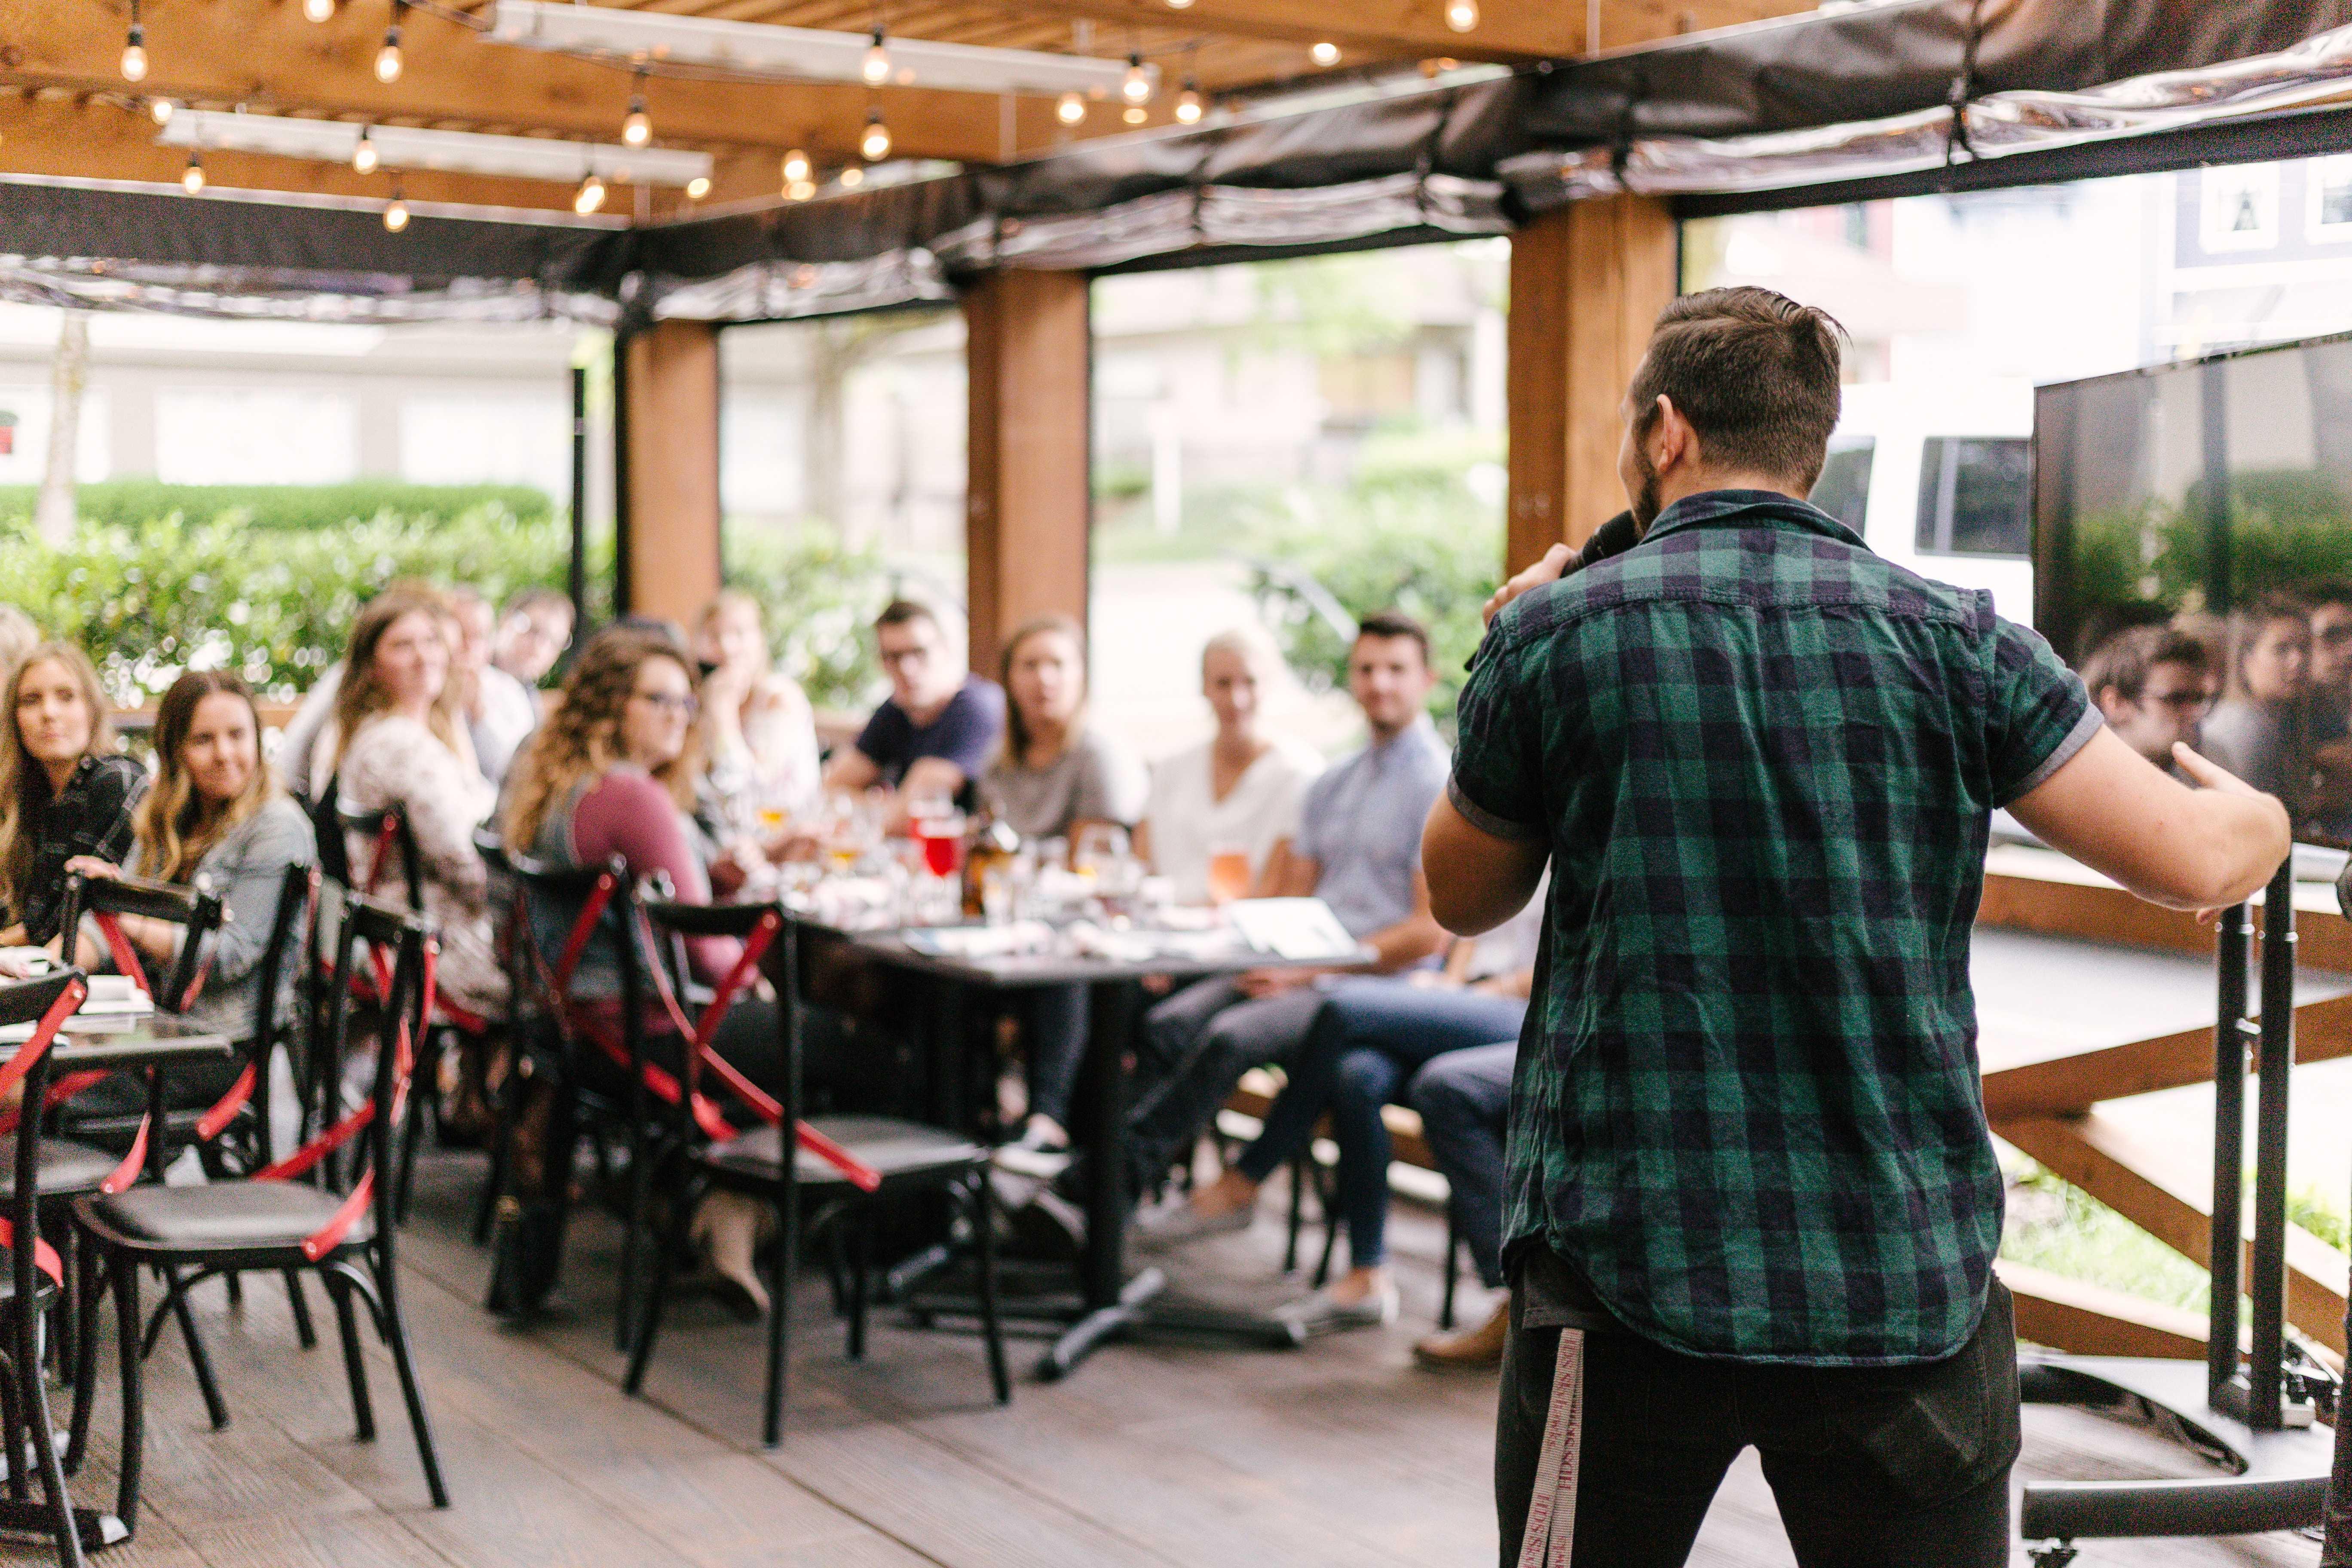 digital nomad conferences and retreats